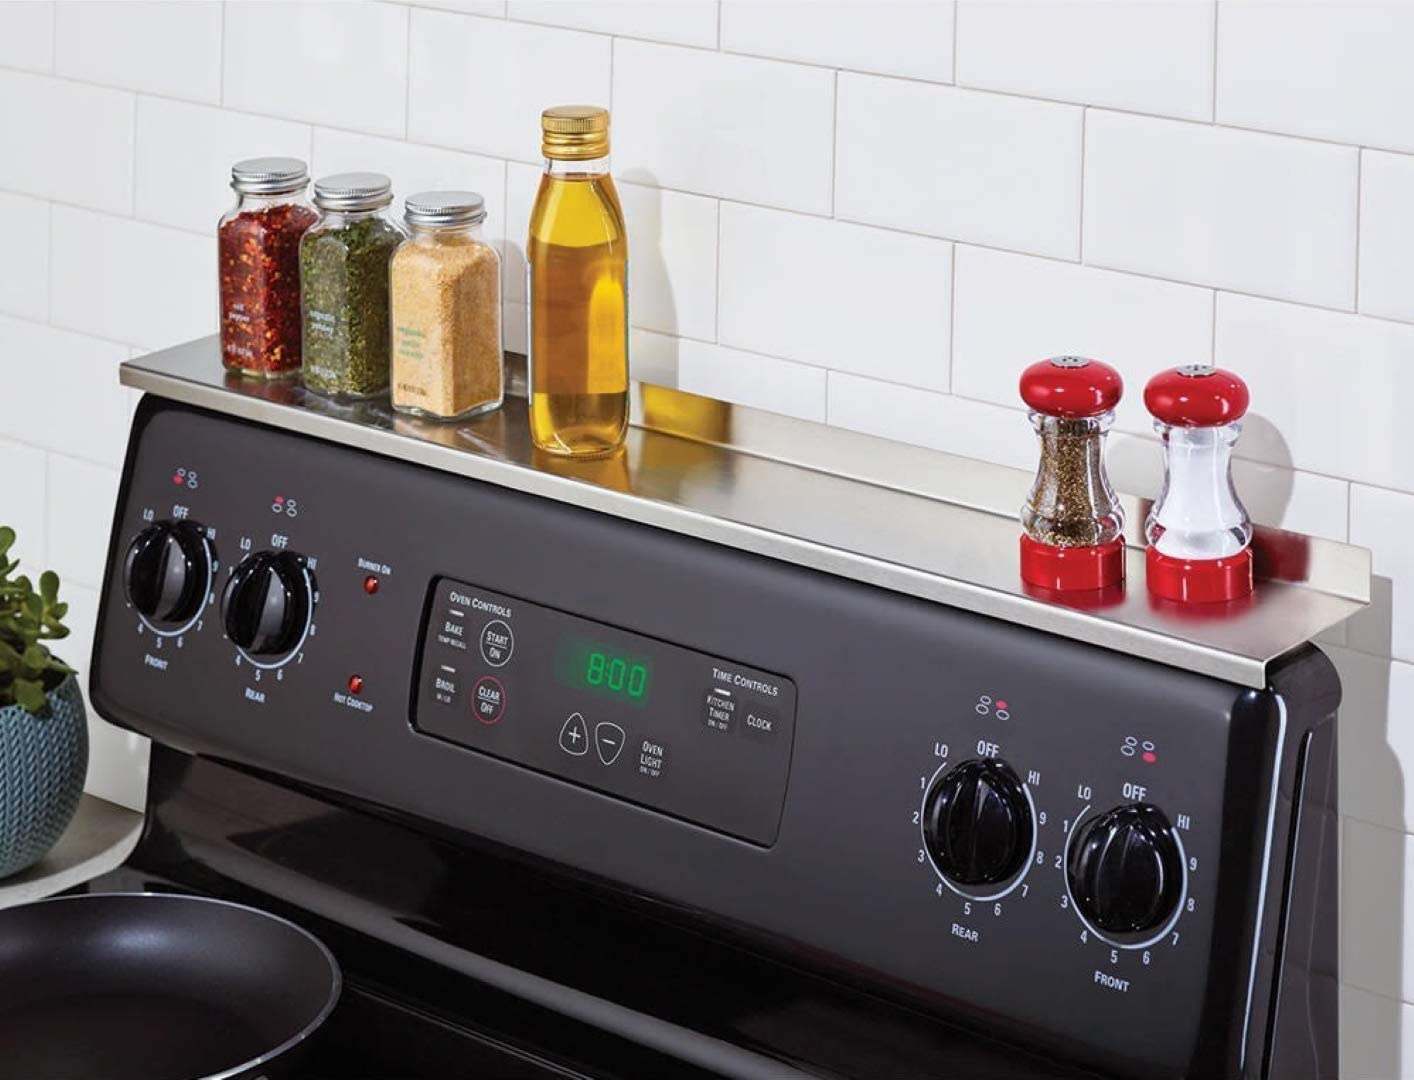 StoveShelf – Stainless Steel – 30 – Magnetic Shelf for Kitchen Stove, Spice Rack, Kitchen Storage Solution, Zero Installation